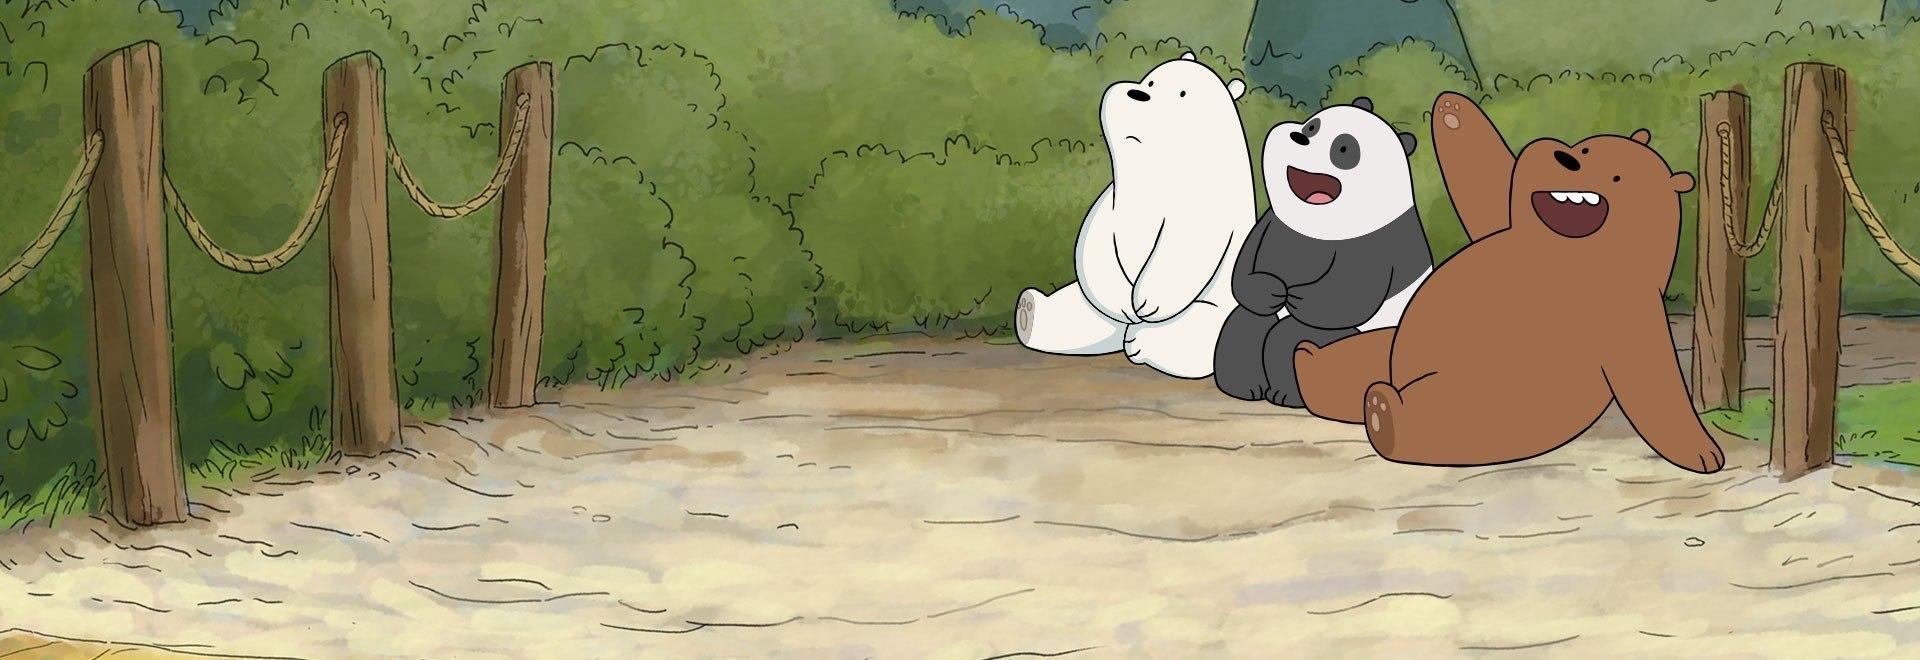 Panda due